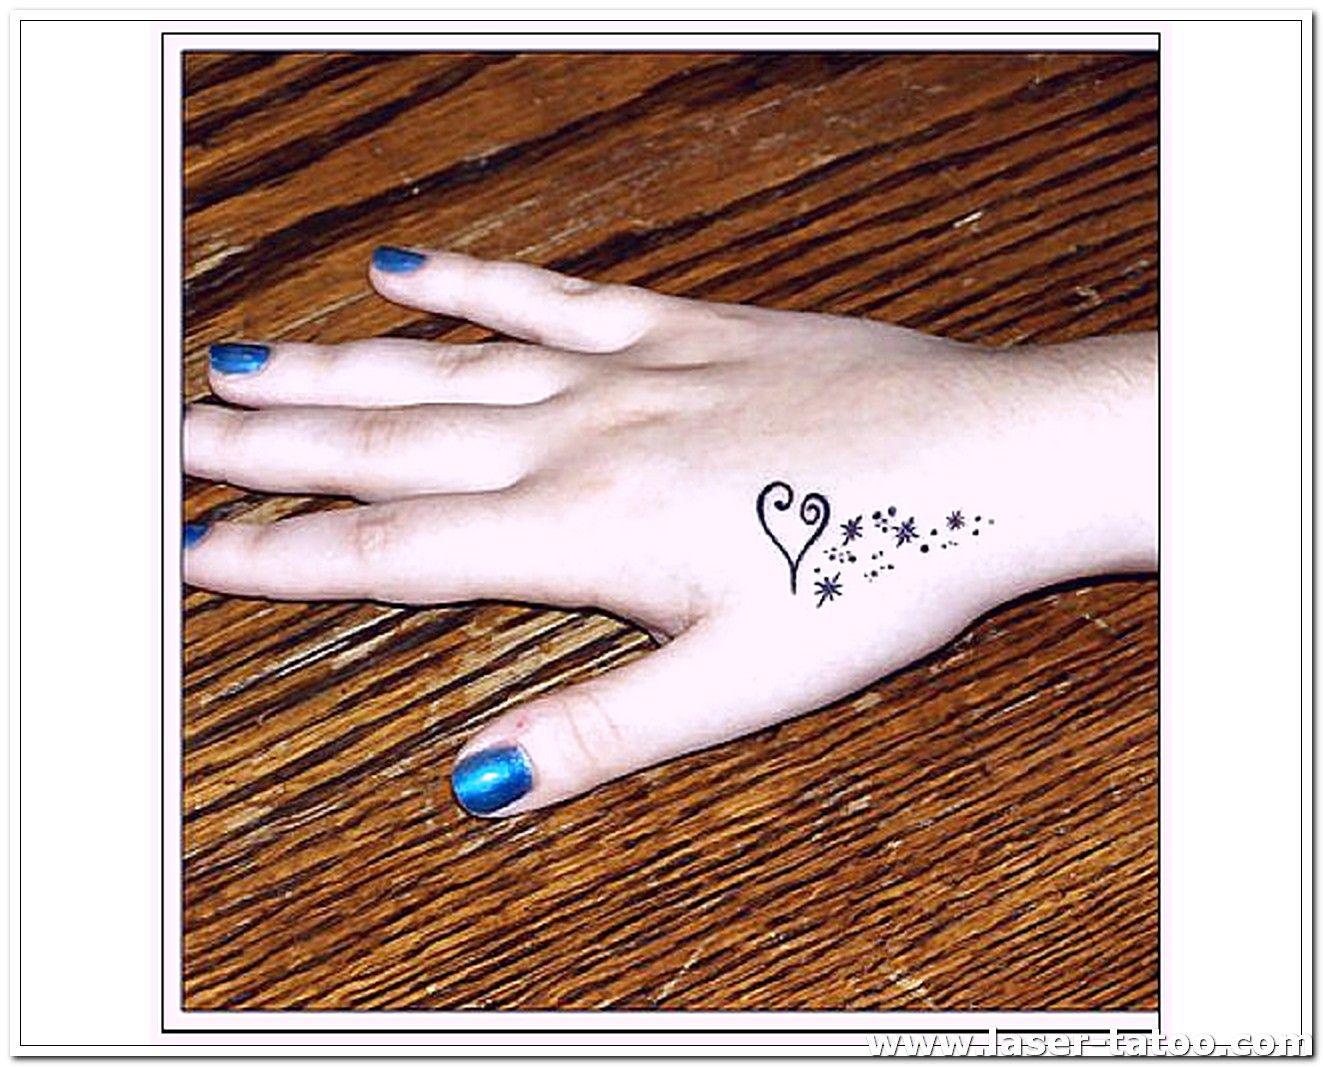 Heart Tattoo Designs For Hand Small Tattoos Girls ...